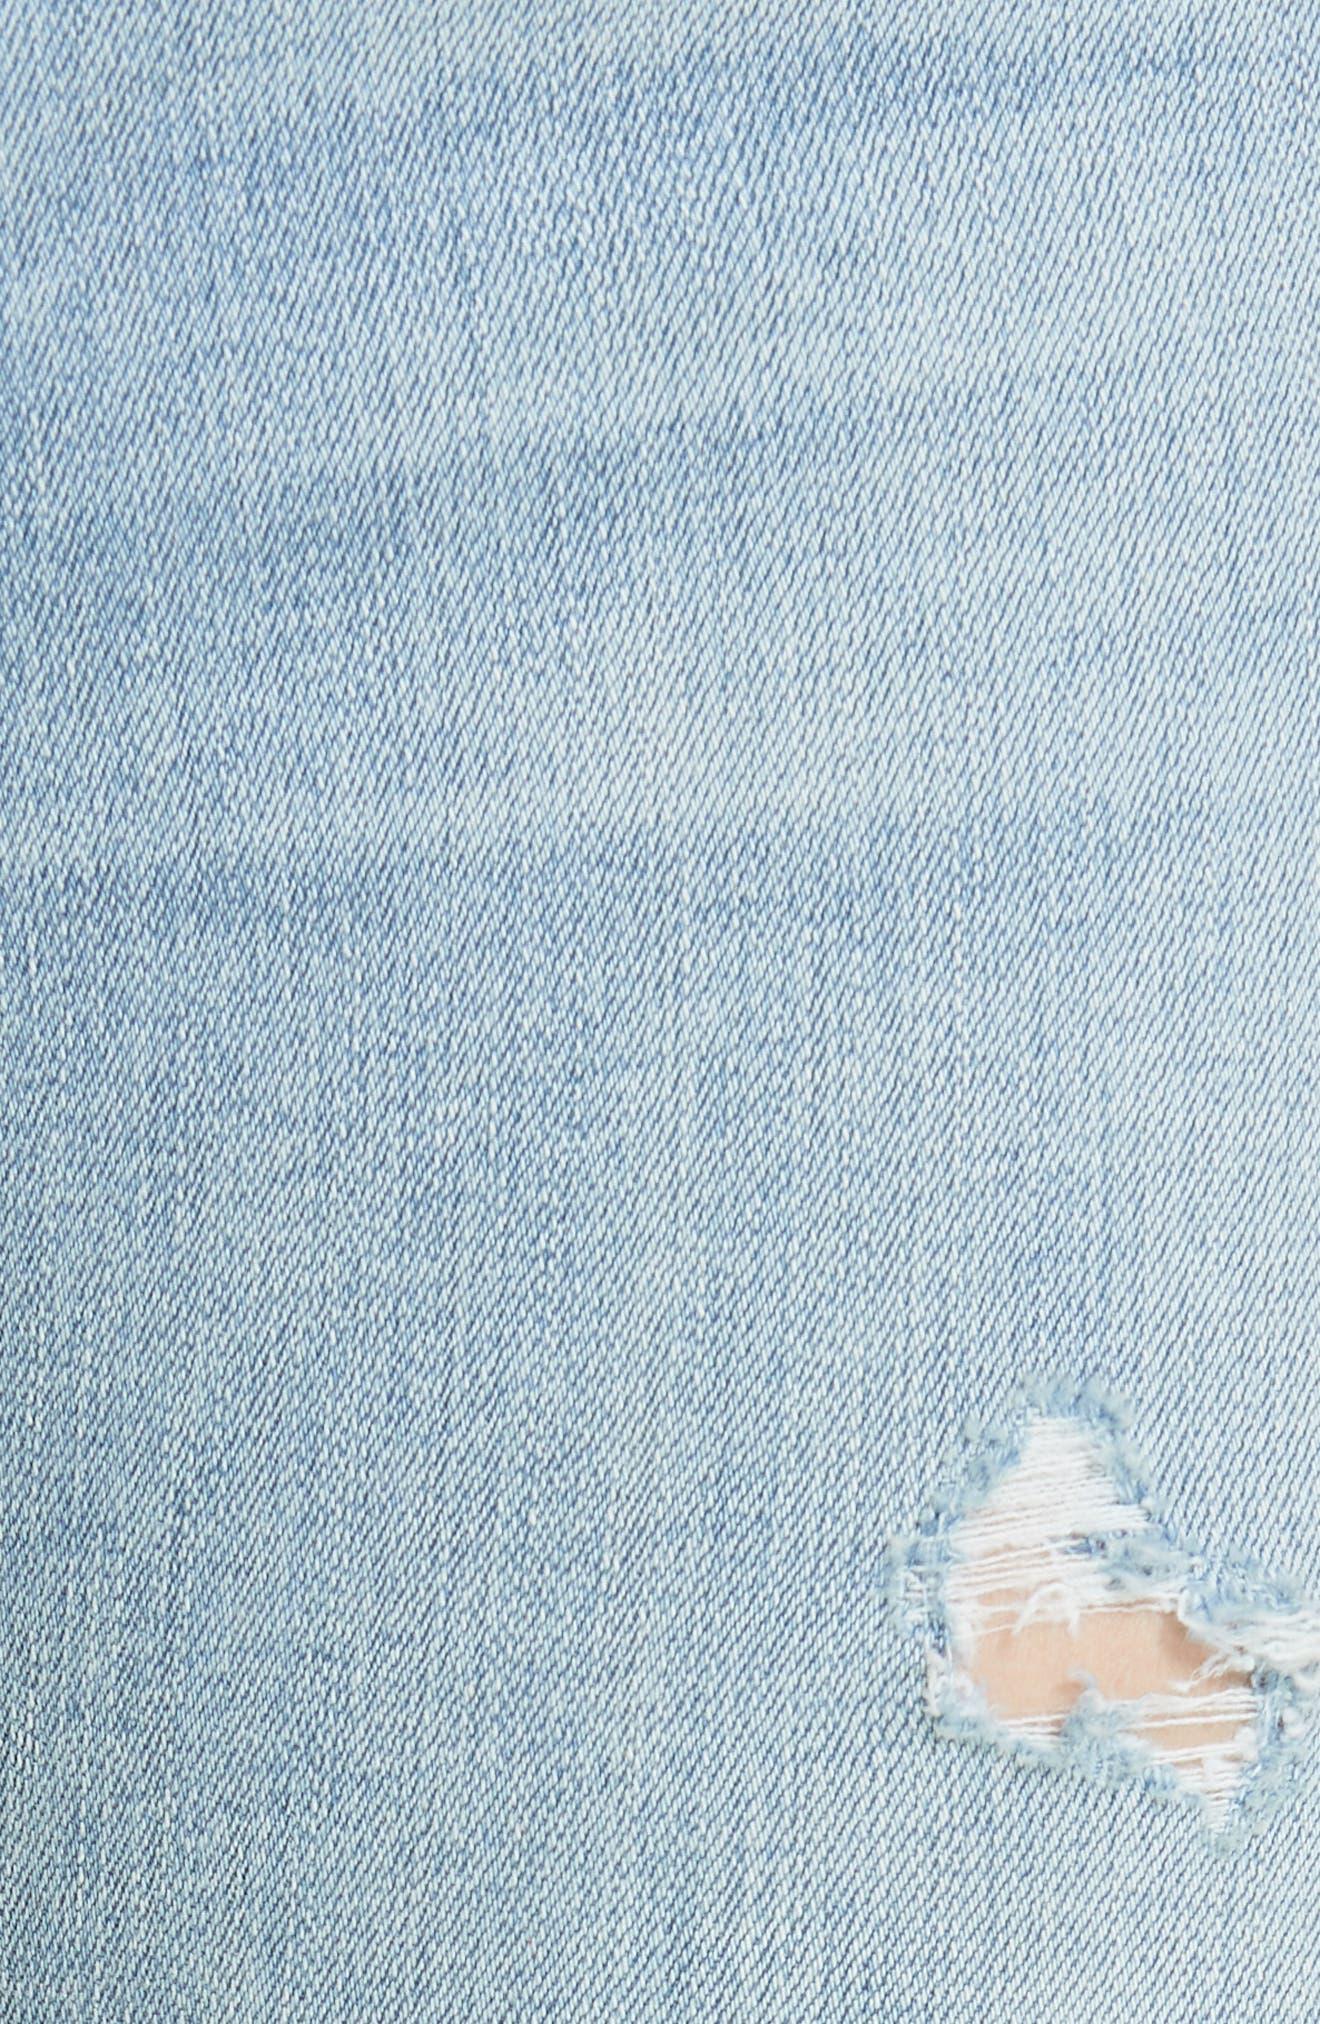 High Waist Ankle Skinny Jeans,                             Alternate thumbnail 5, color,                             Norlet